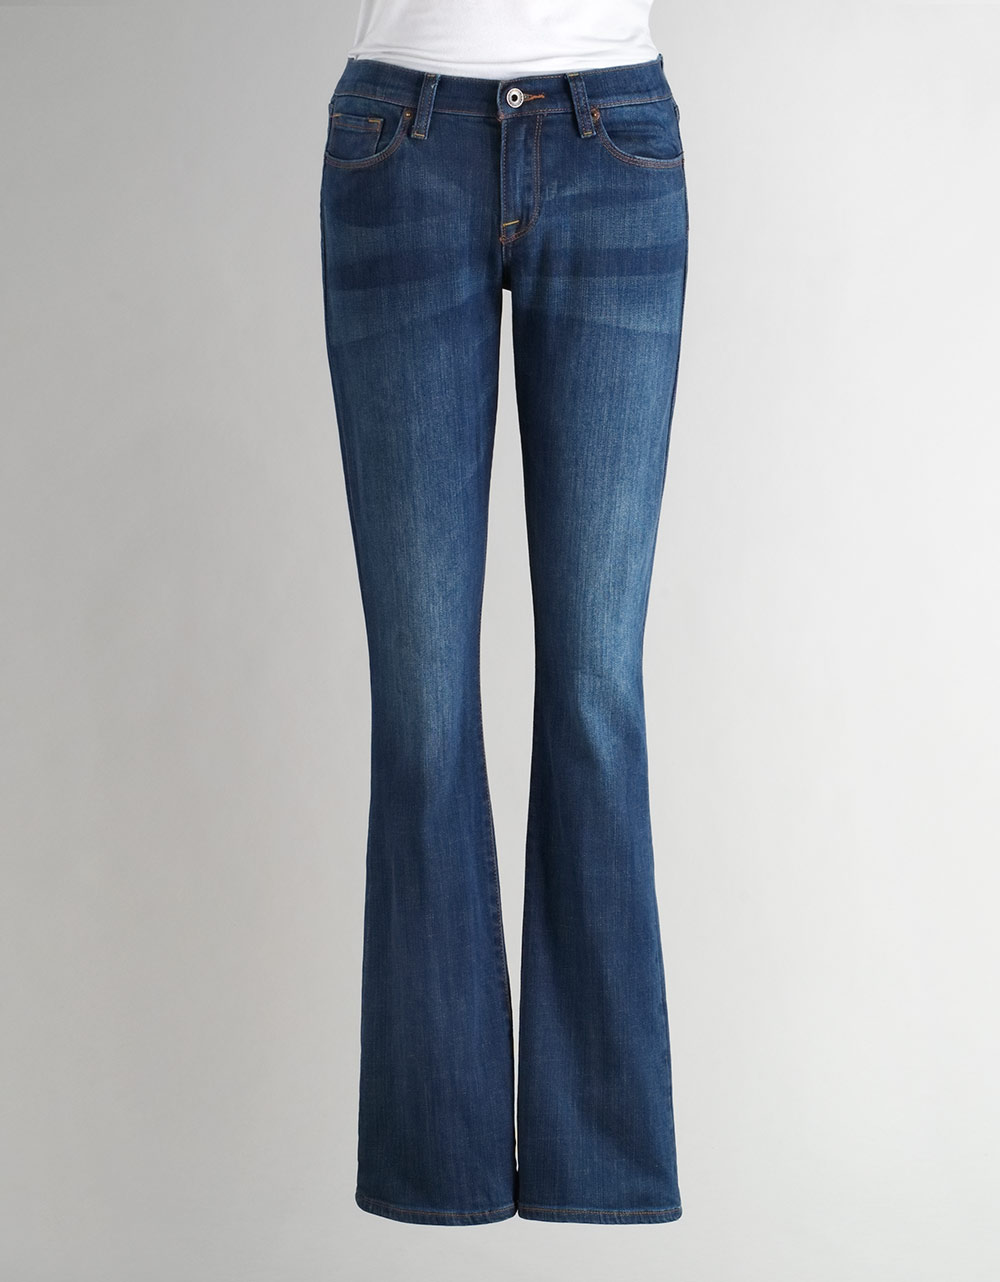 Long Bootcut Jeans